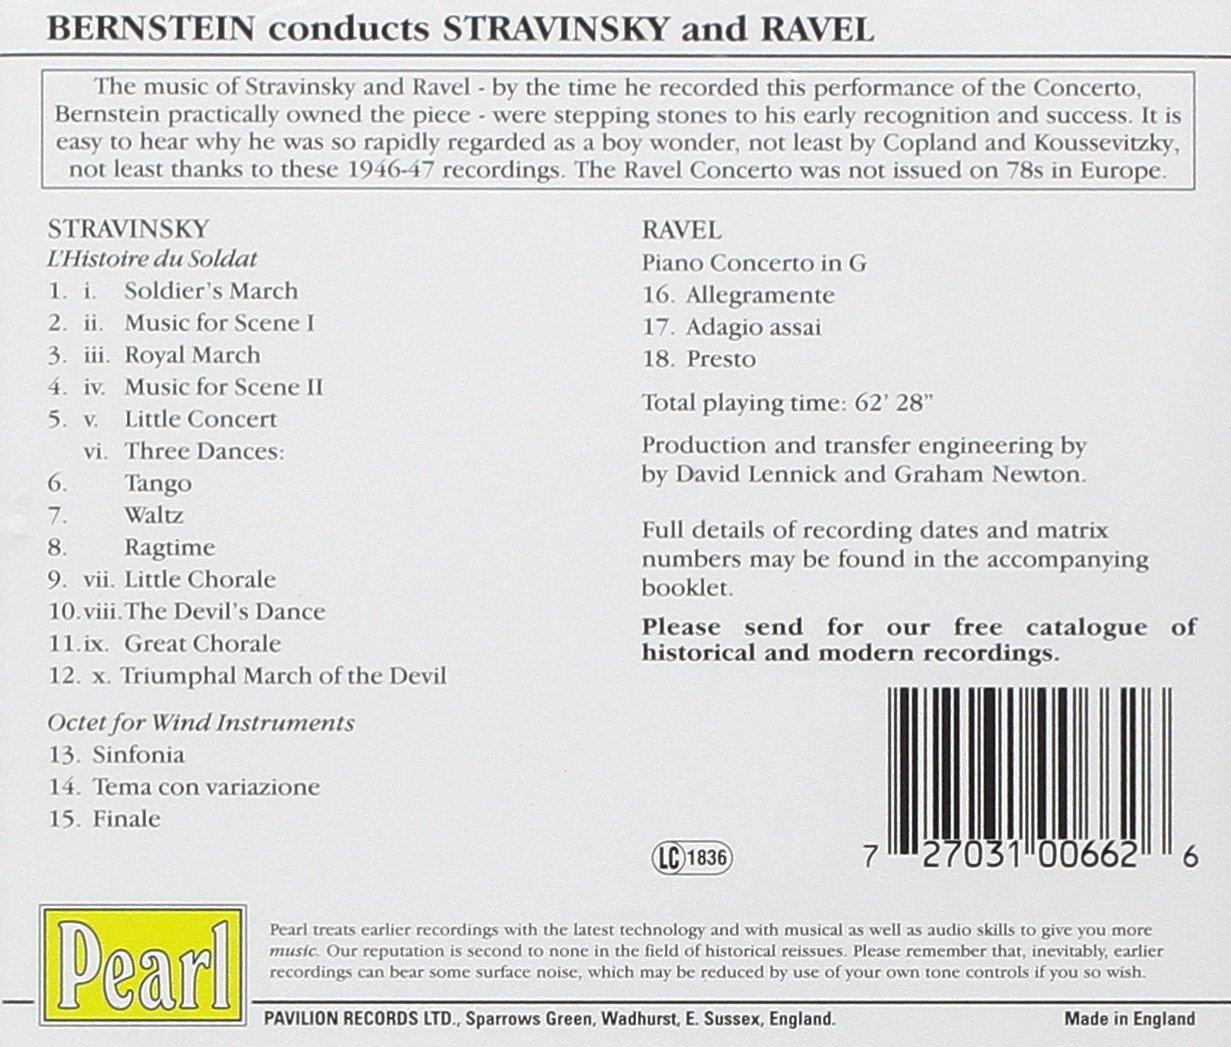 Bernstein tour dates for 2019 - RA